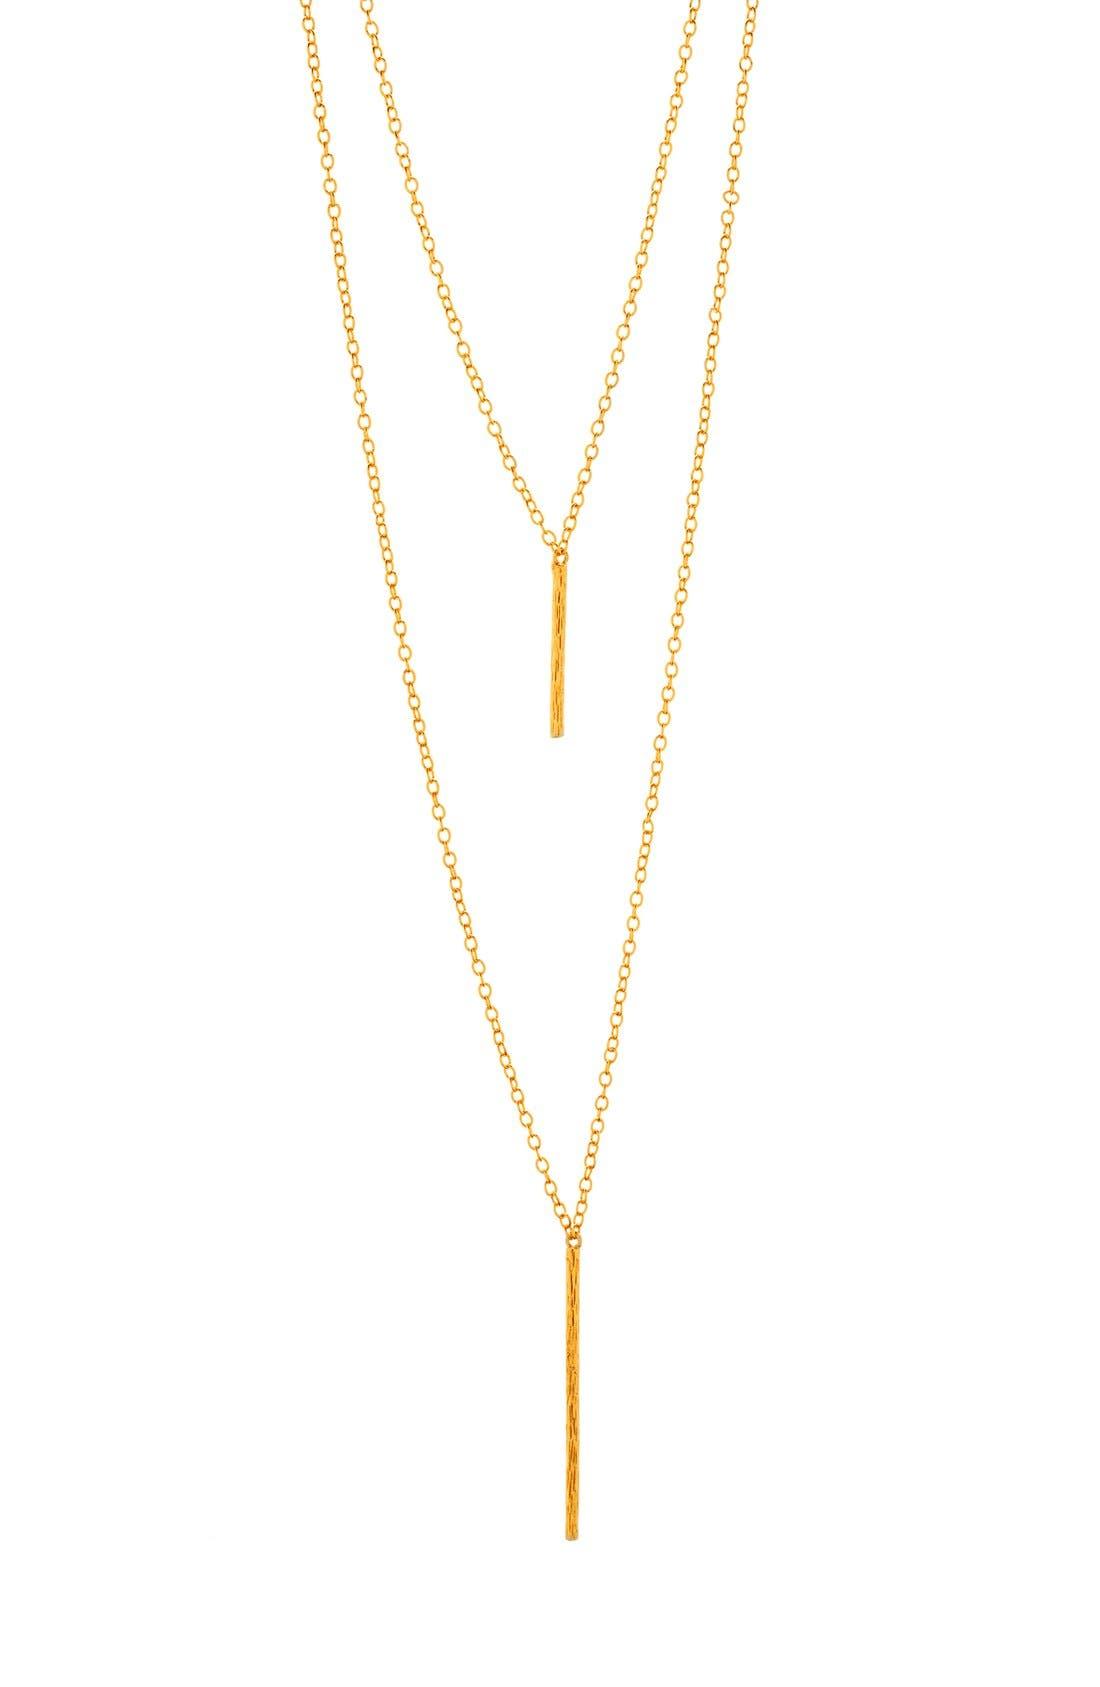 Main Image - gorjana 'Kiernan' Layered Pendant Necklace